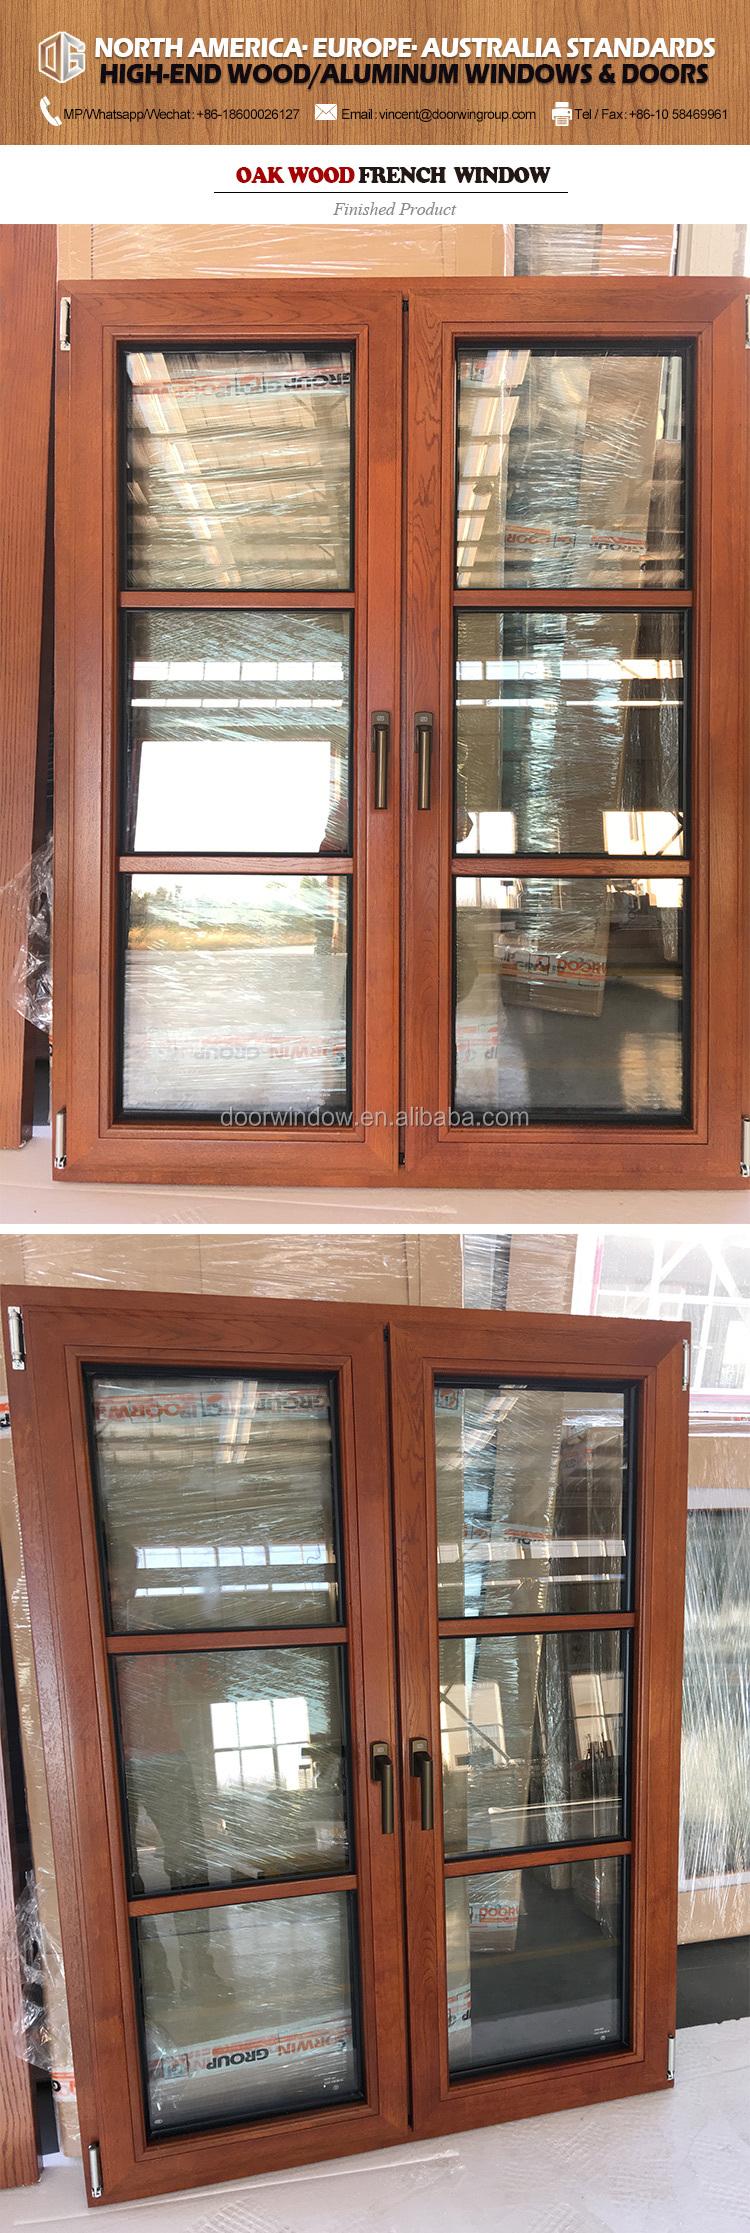 new sash windows double glazed